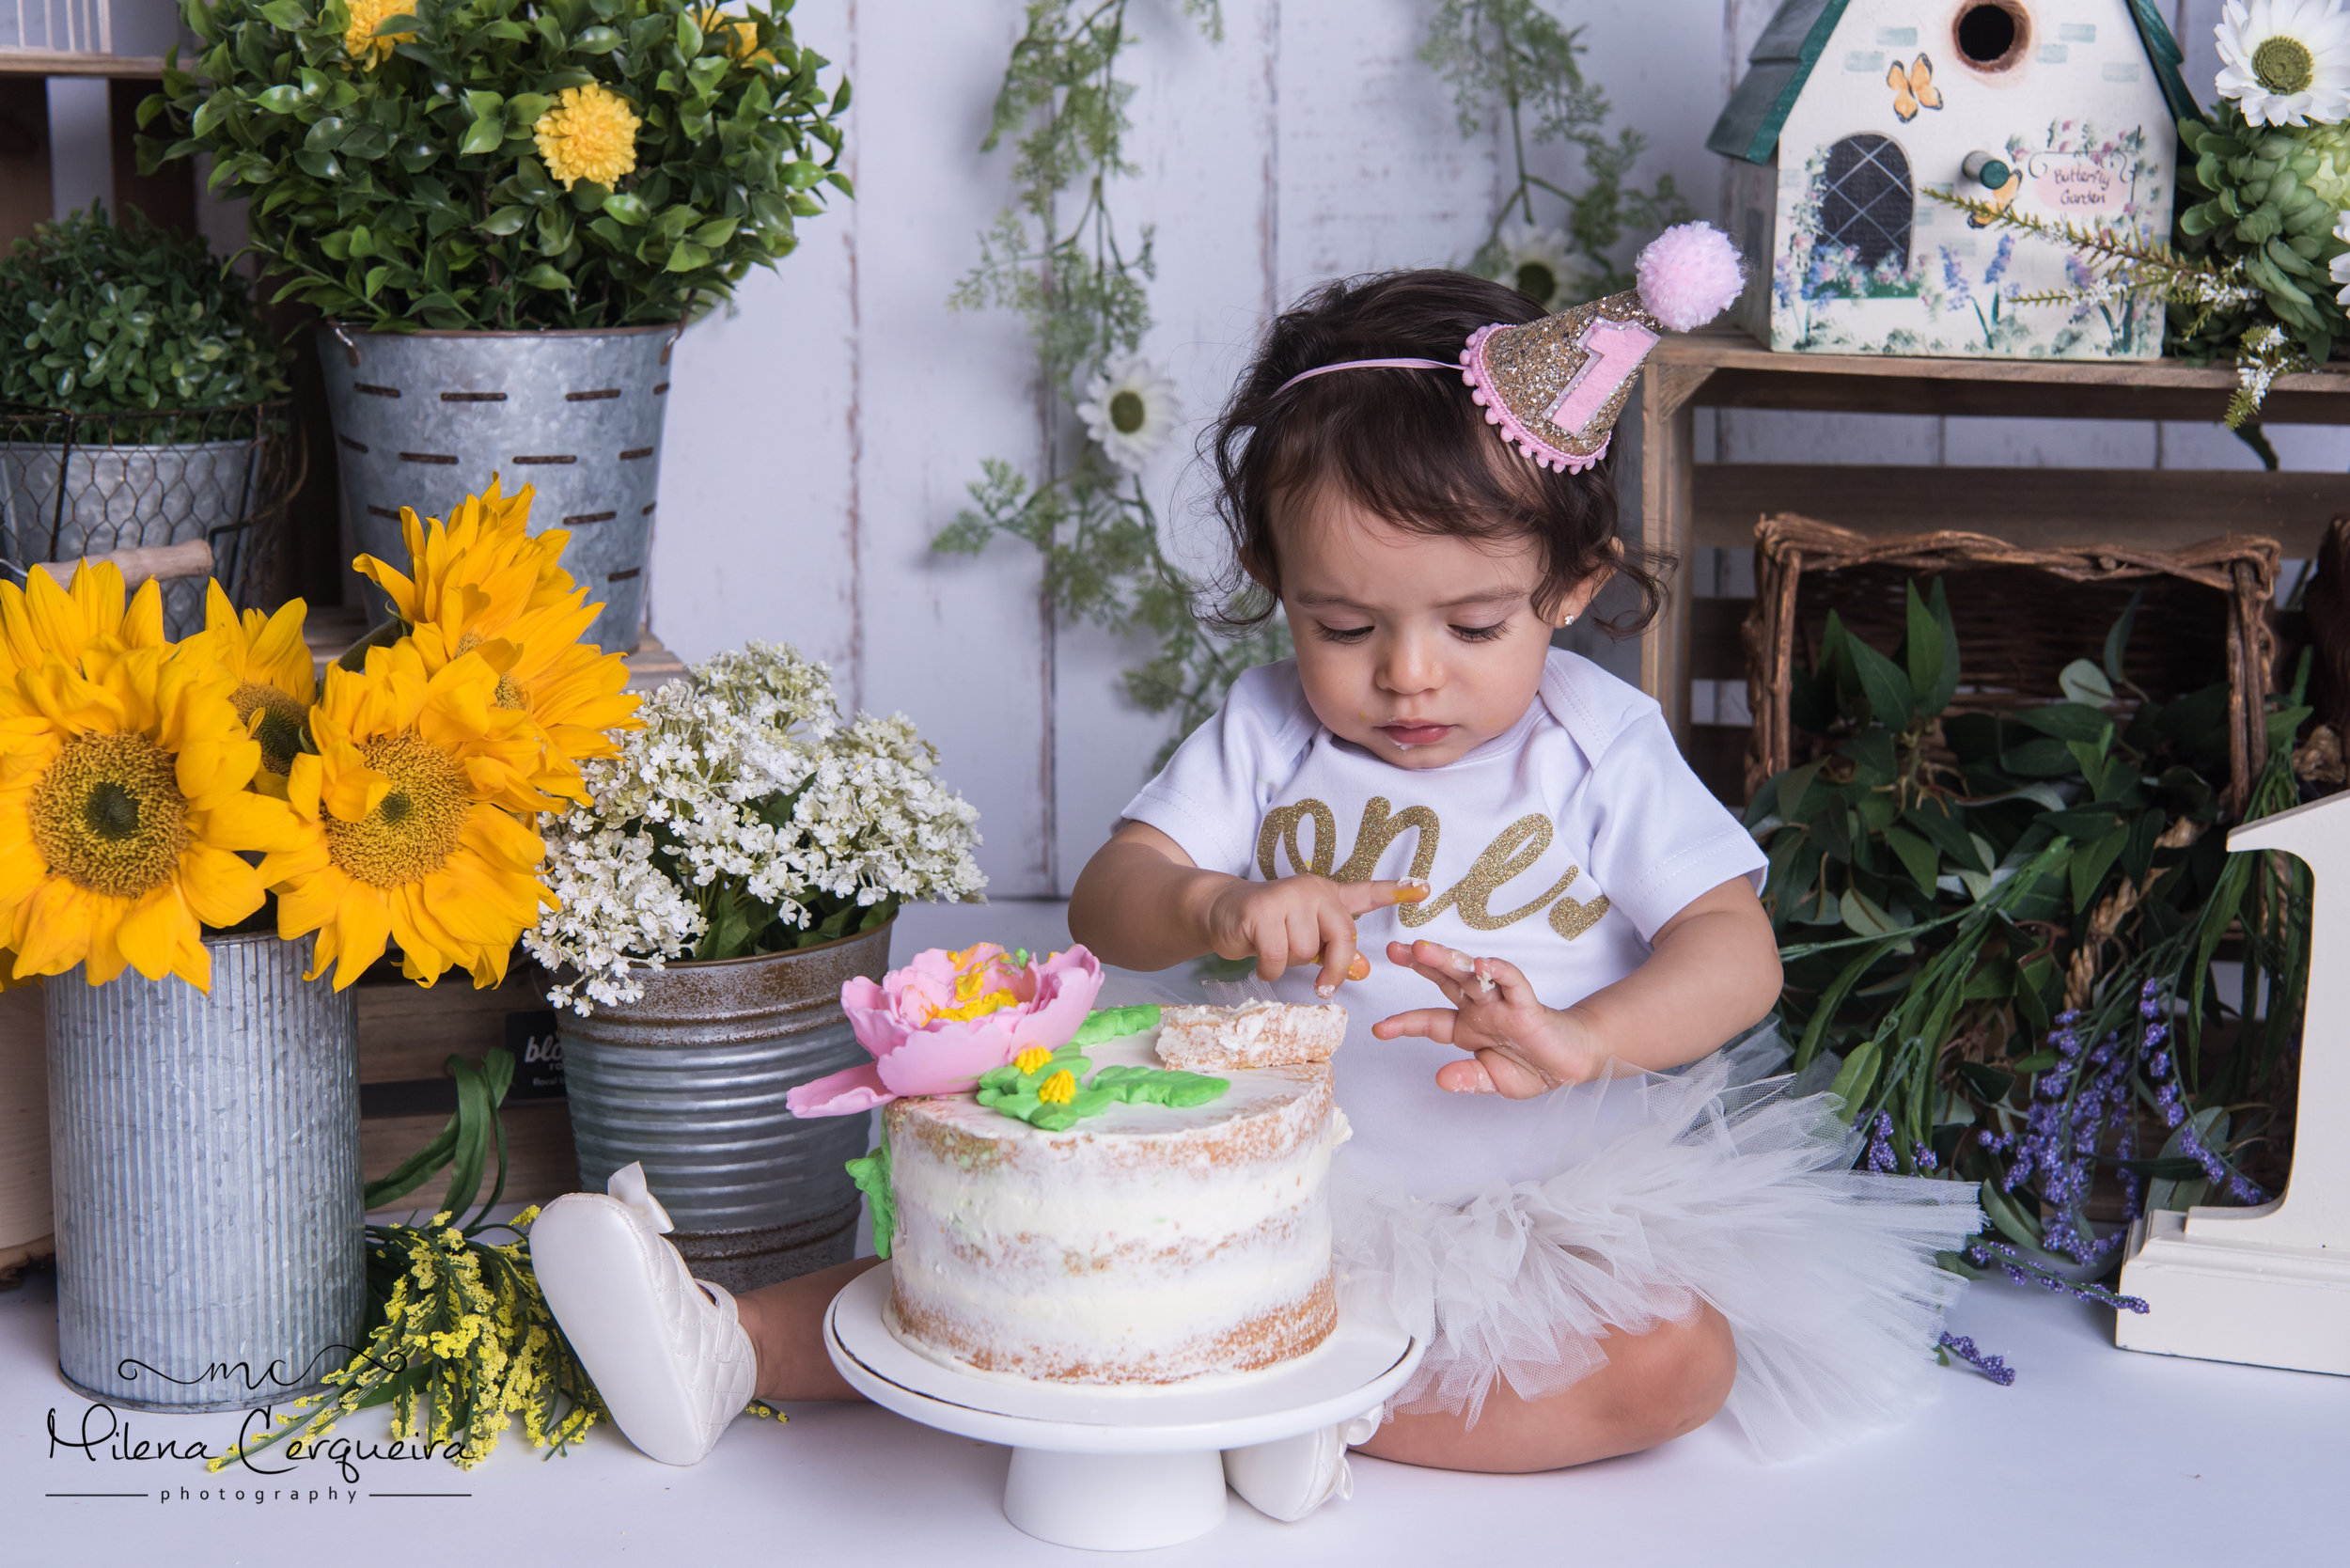 Cake Smash Photography - View cake smash portrait gallery now